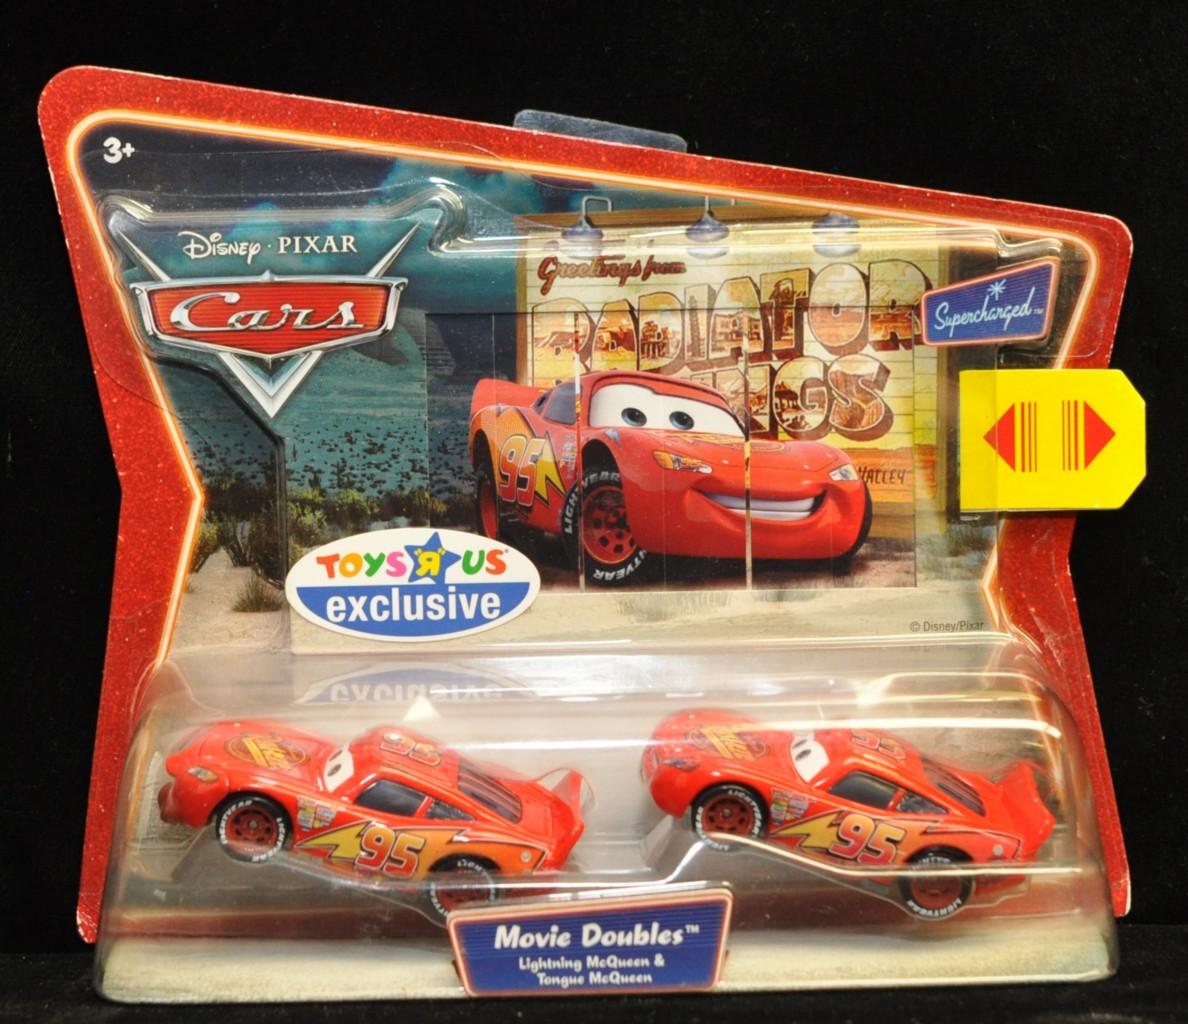 Disney pixar cars toys r us exclusive movie double nip noc for Bureau cars toys r us